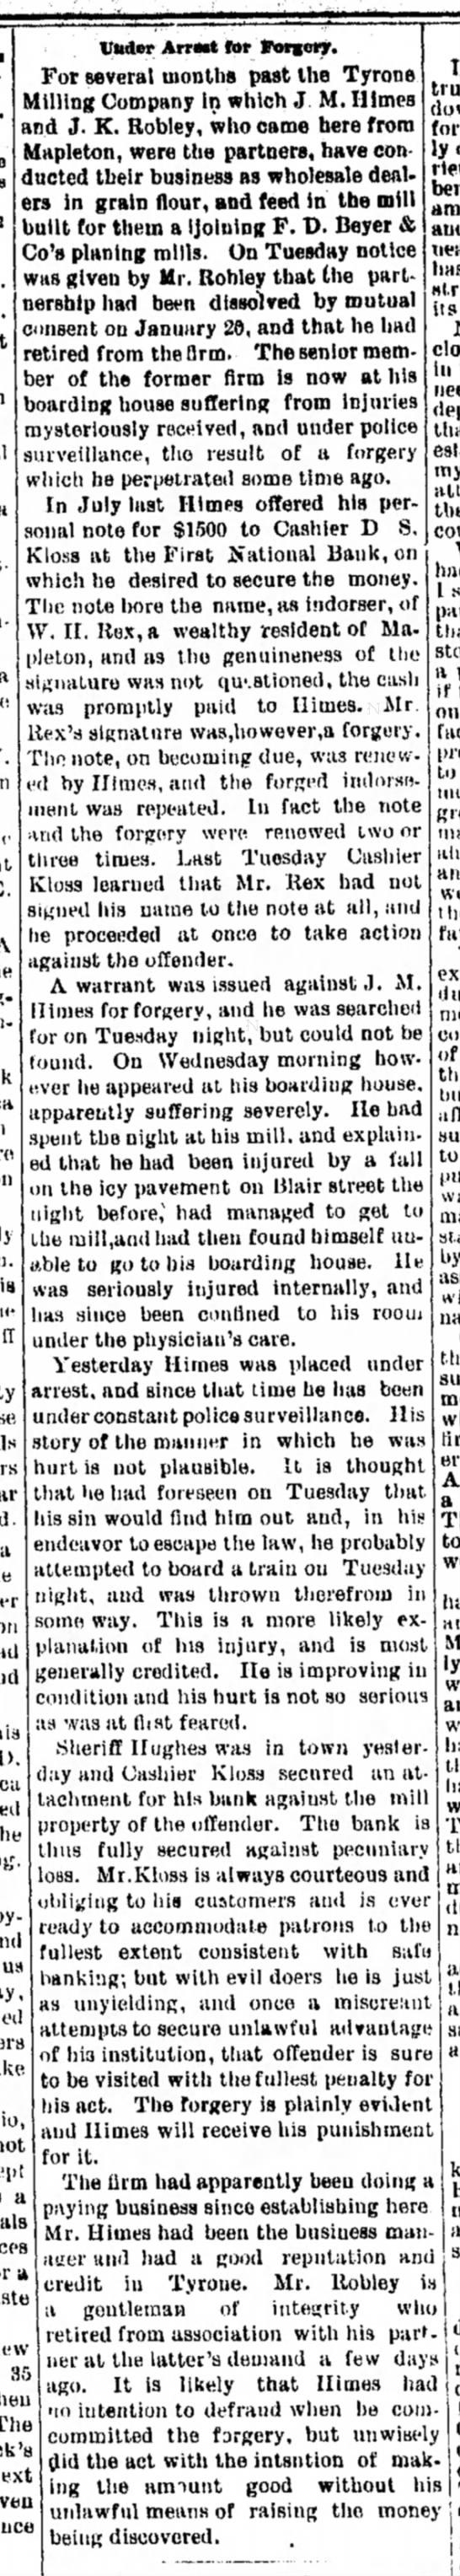 John K. Robley-mill-Tyrone Daily Herald-p.4-28 Jan 1892